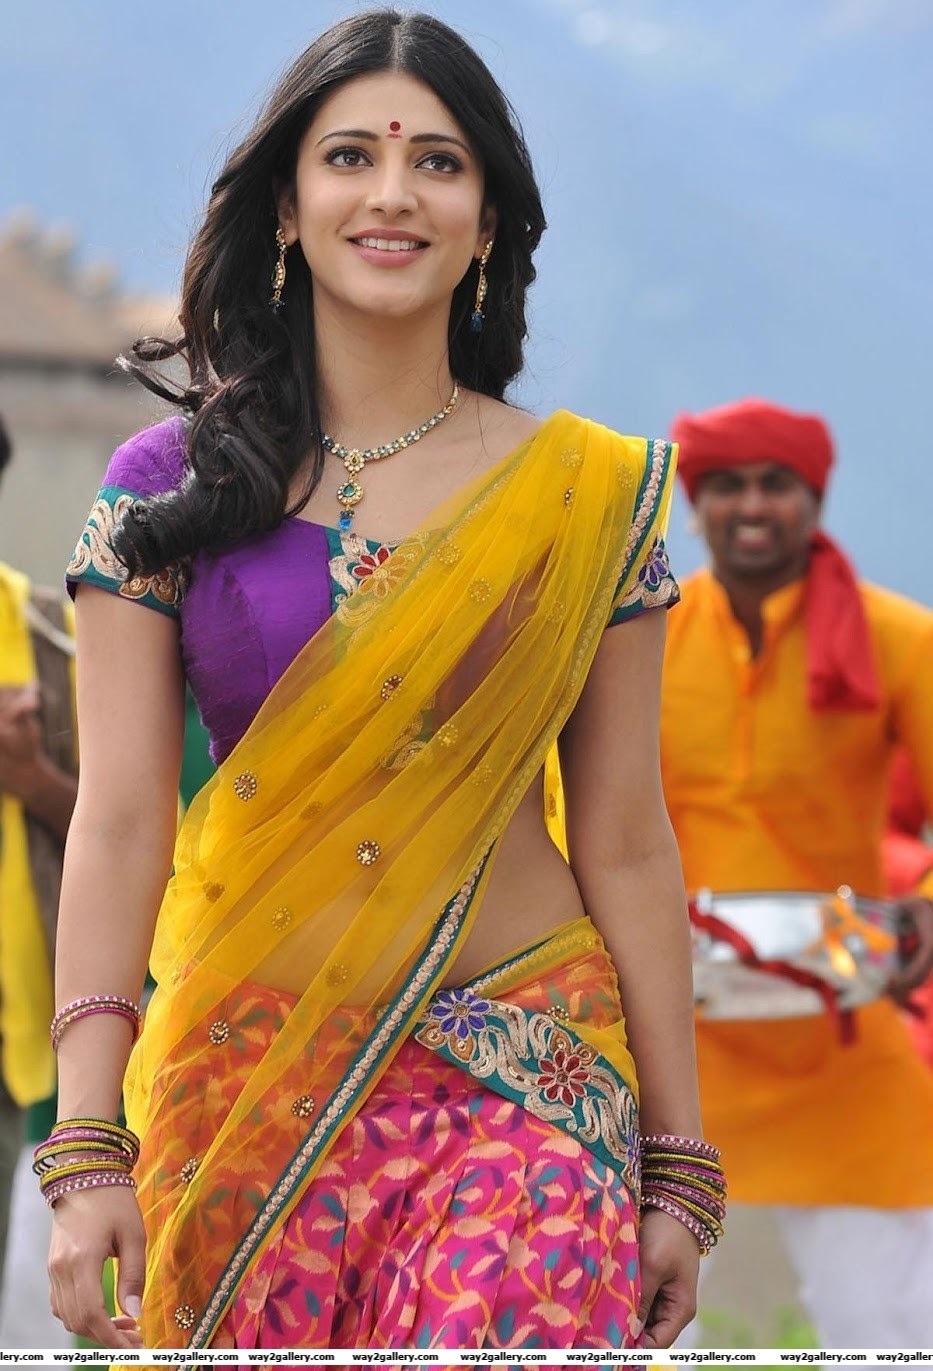 Shruthi Hassan In saree new romantic photo gallery JPG